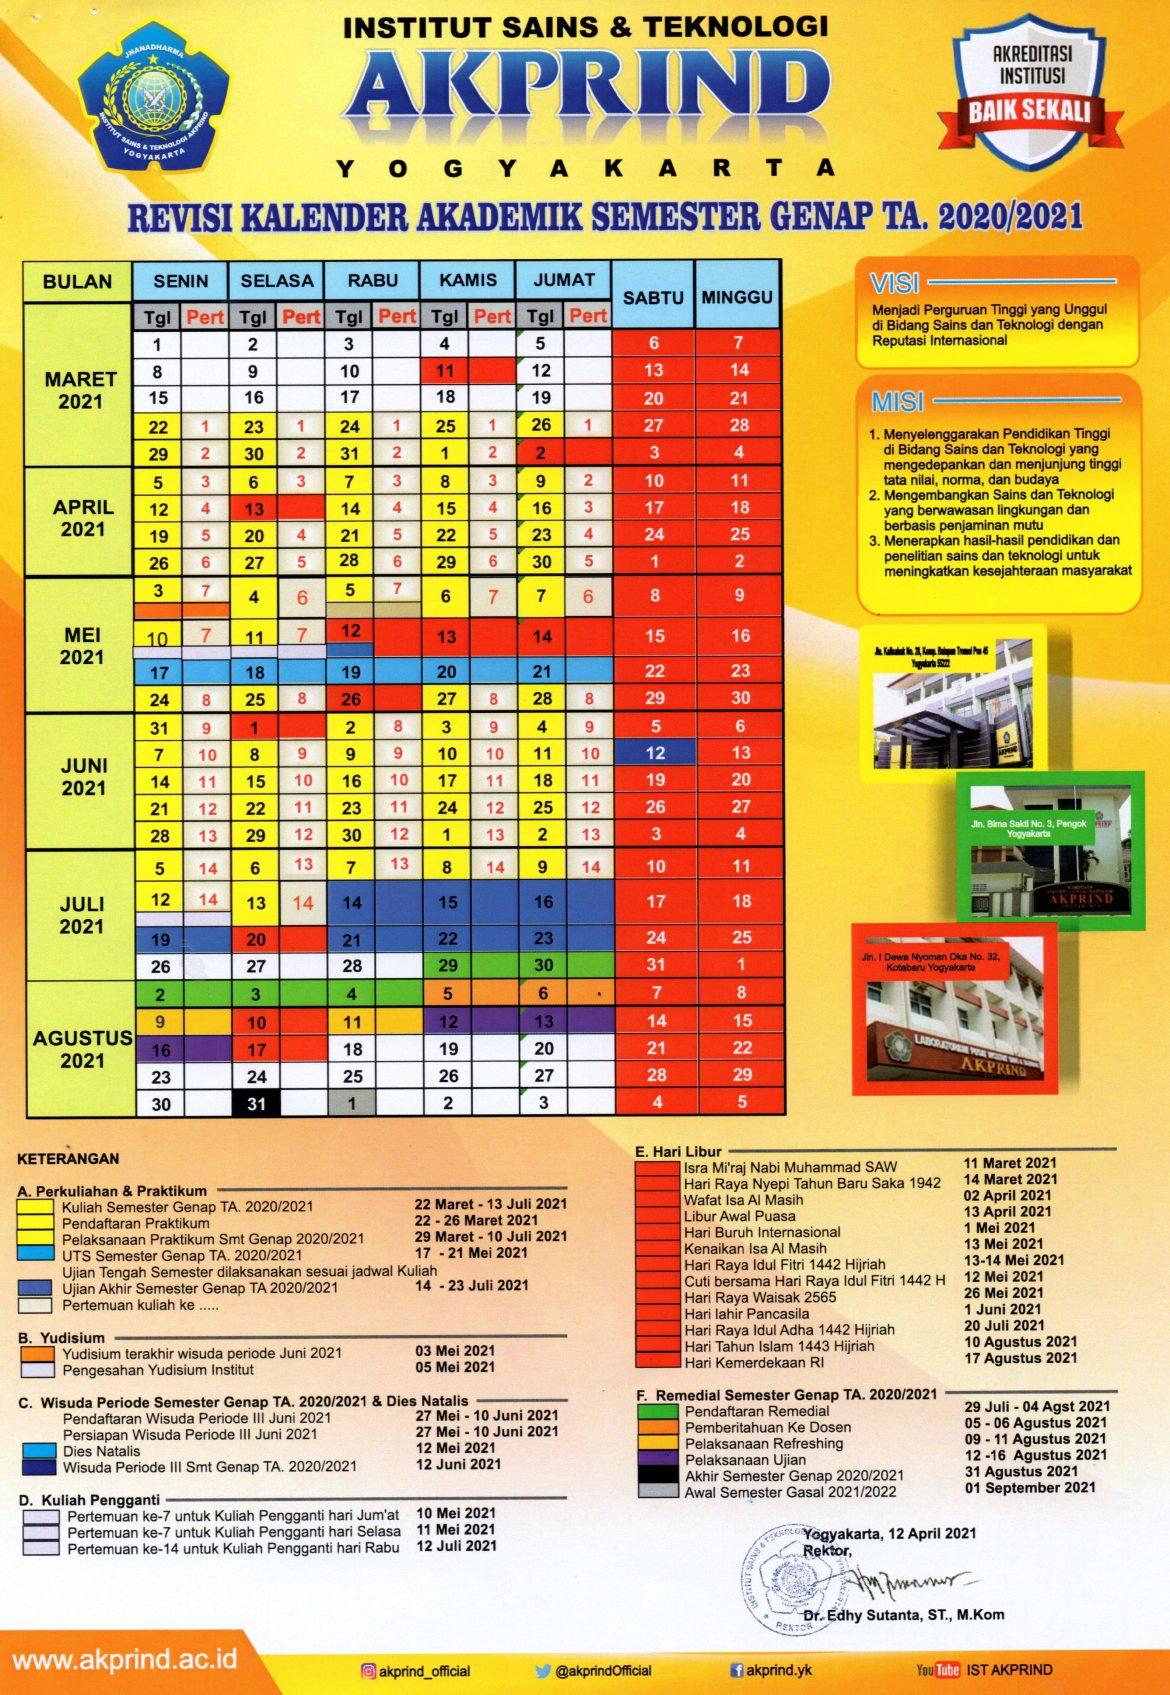 Revisi Kalender Akademik 20.2